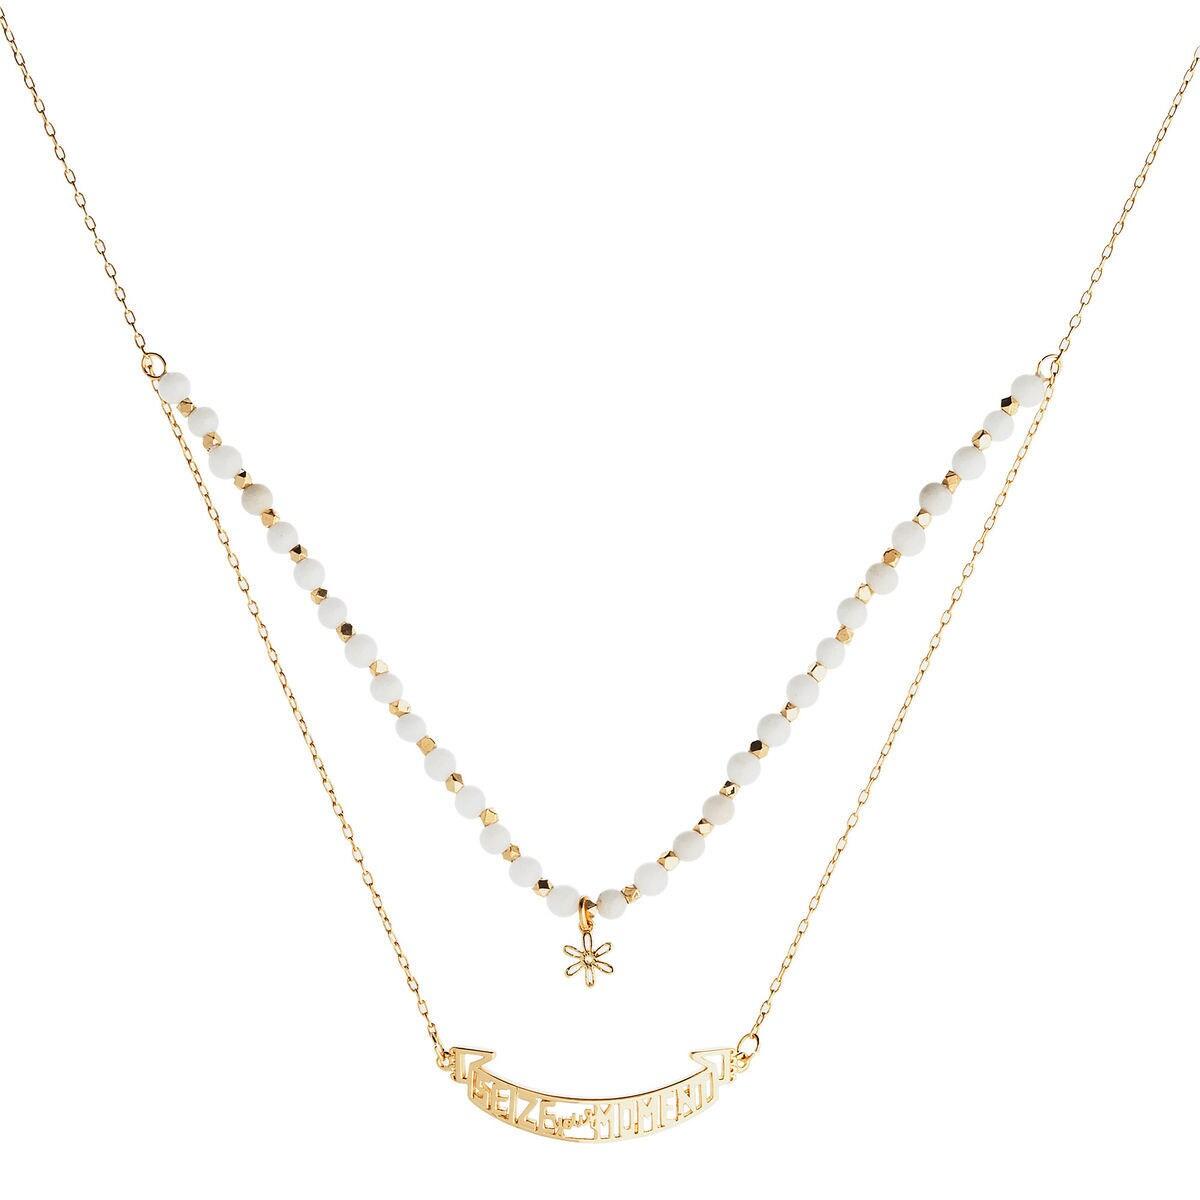 coco seize your moment necklace shopdisney